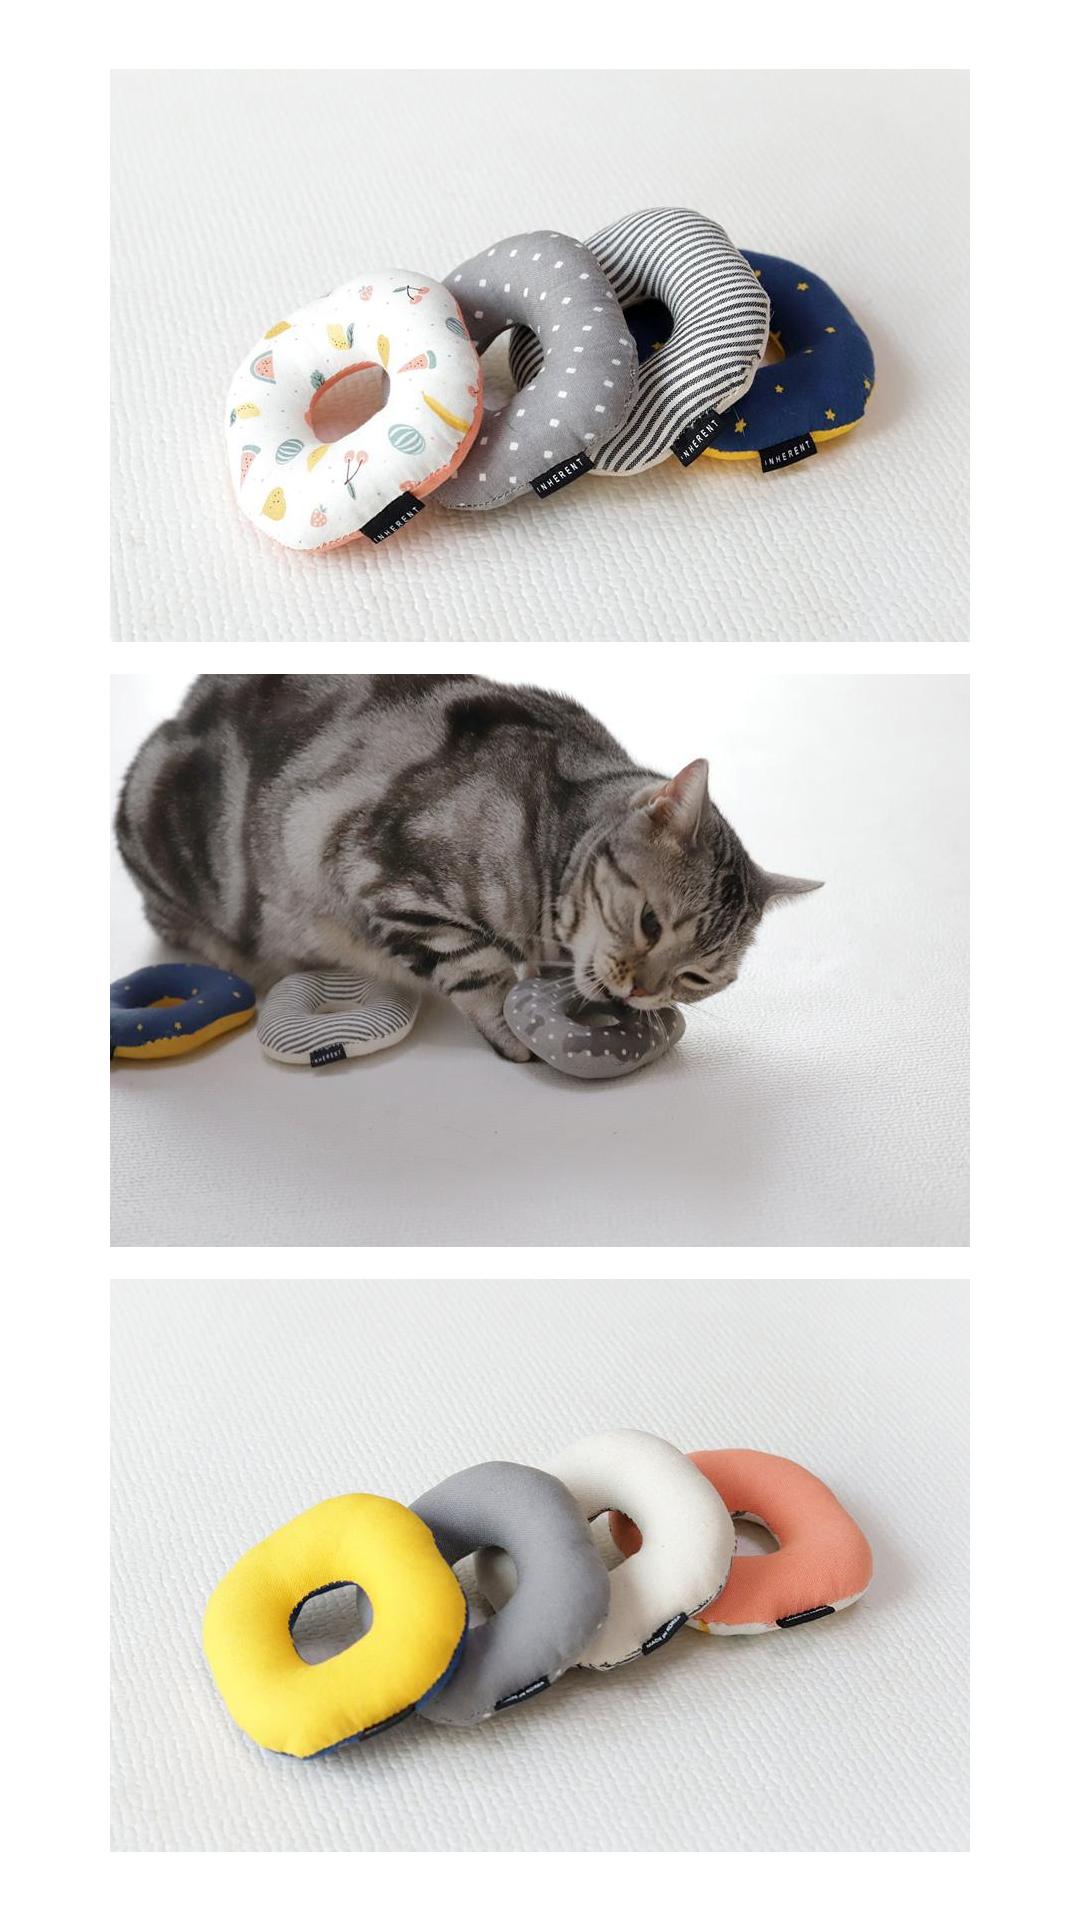 Cats Love Catnip Cute Little Kittens Little Kittens Cat Toys